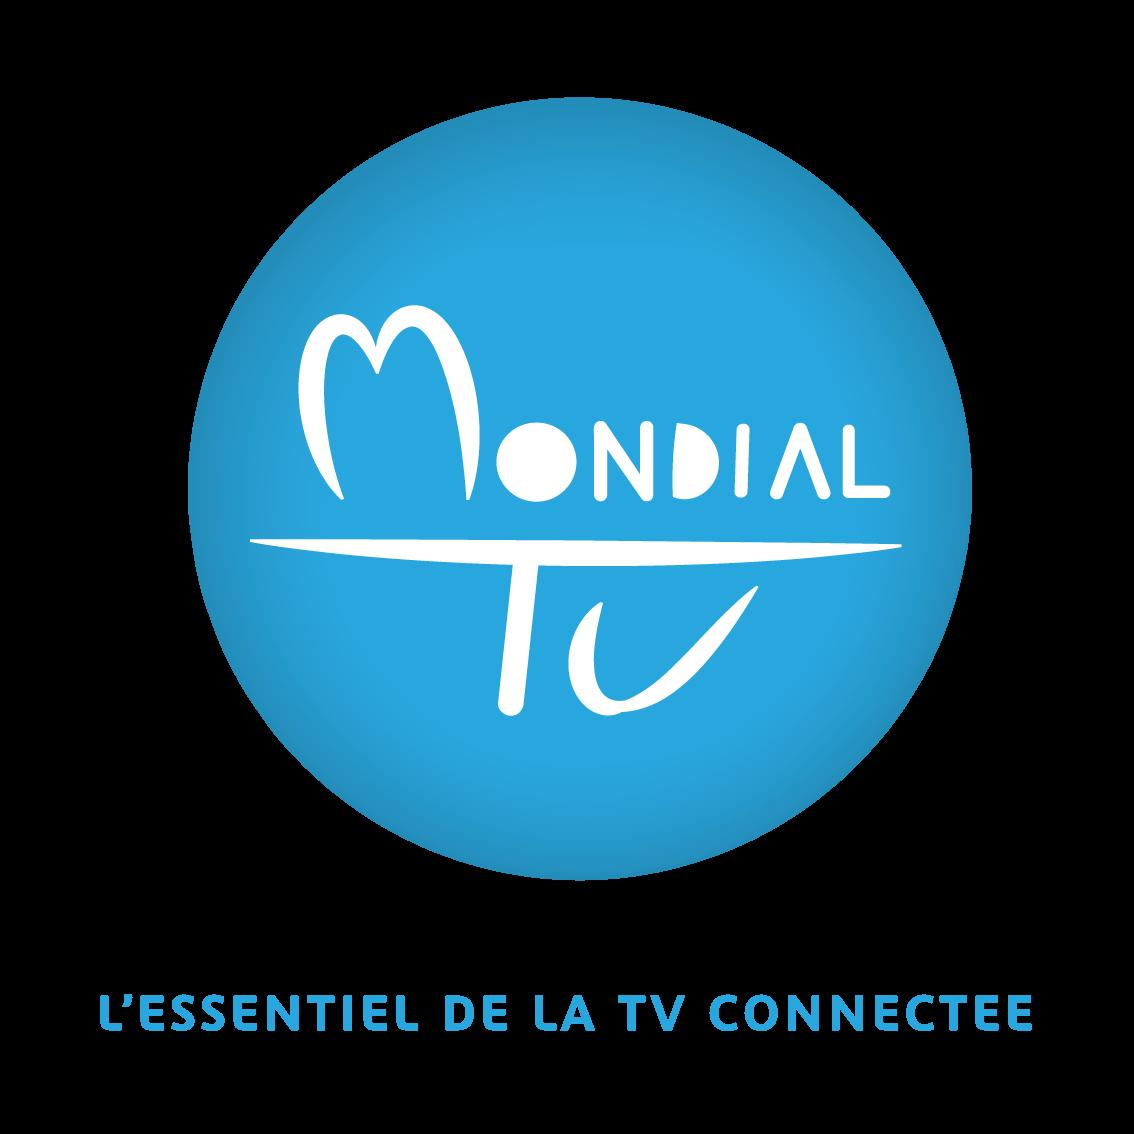 Mondial TV